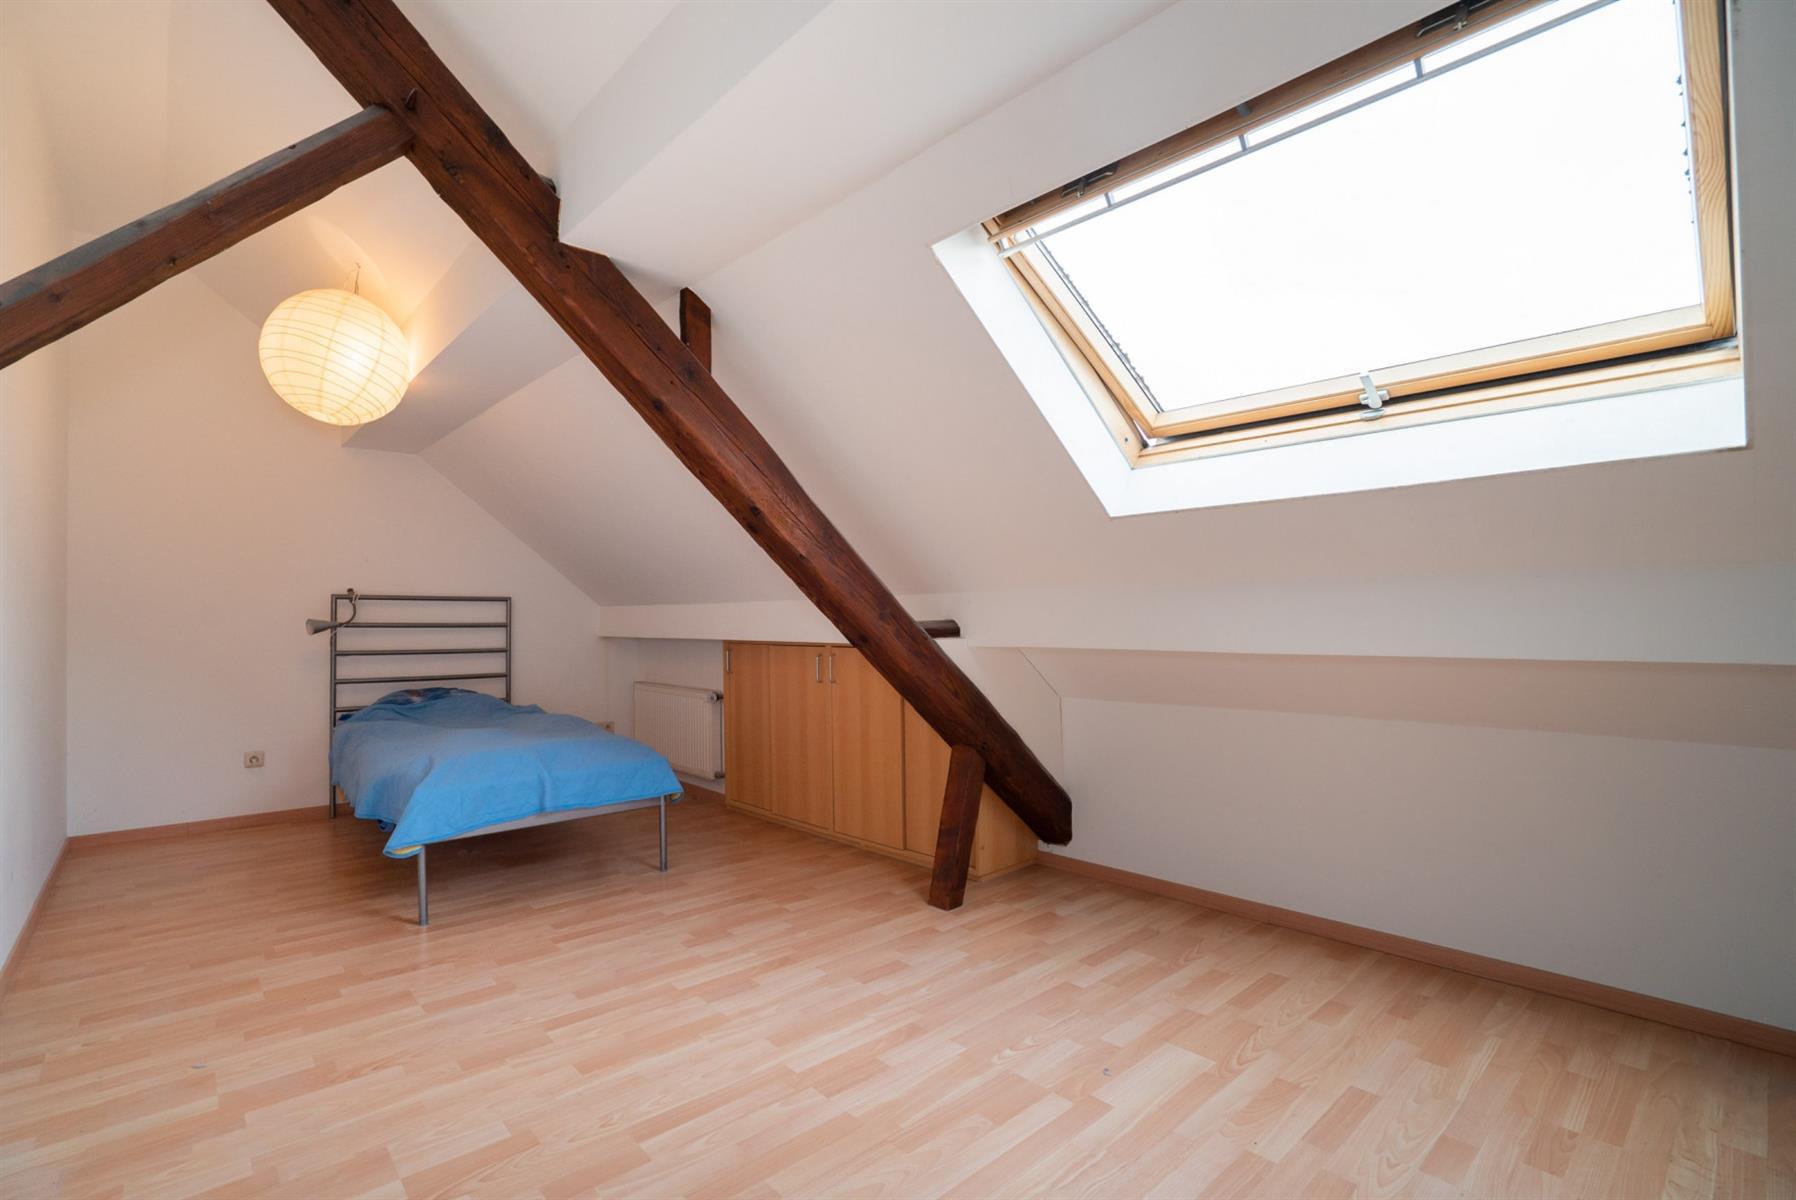 Appartement - Welkenraedt Henri-Chapelle - #4270873-5